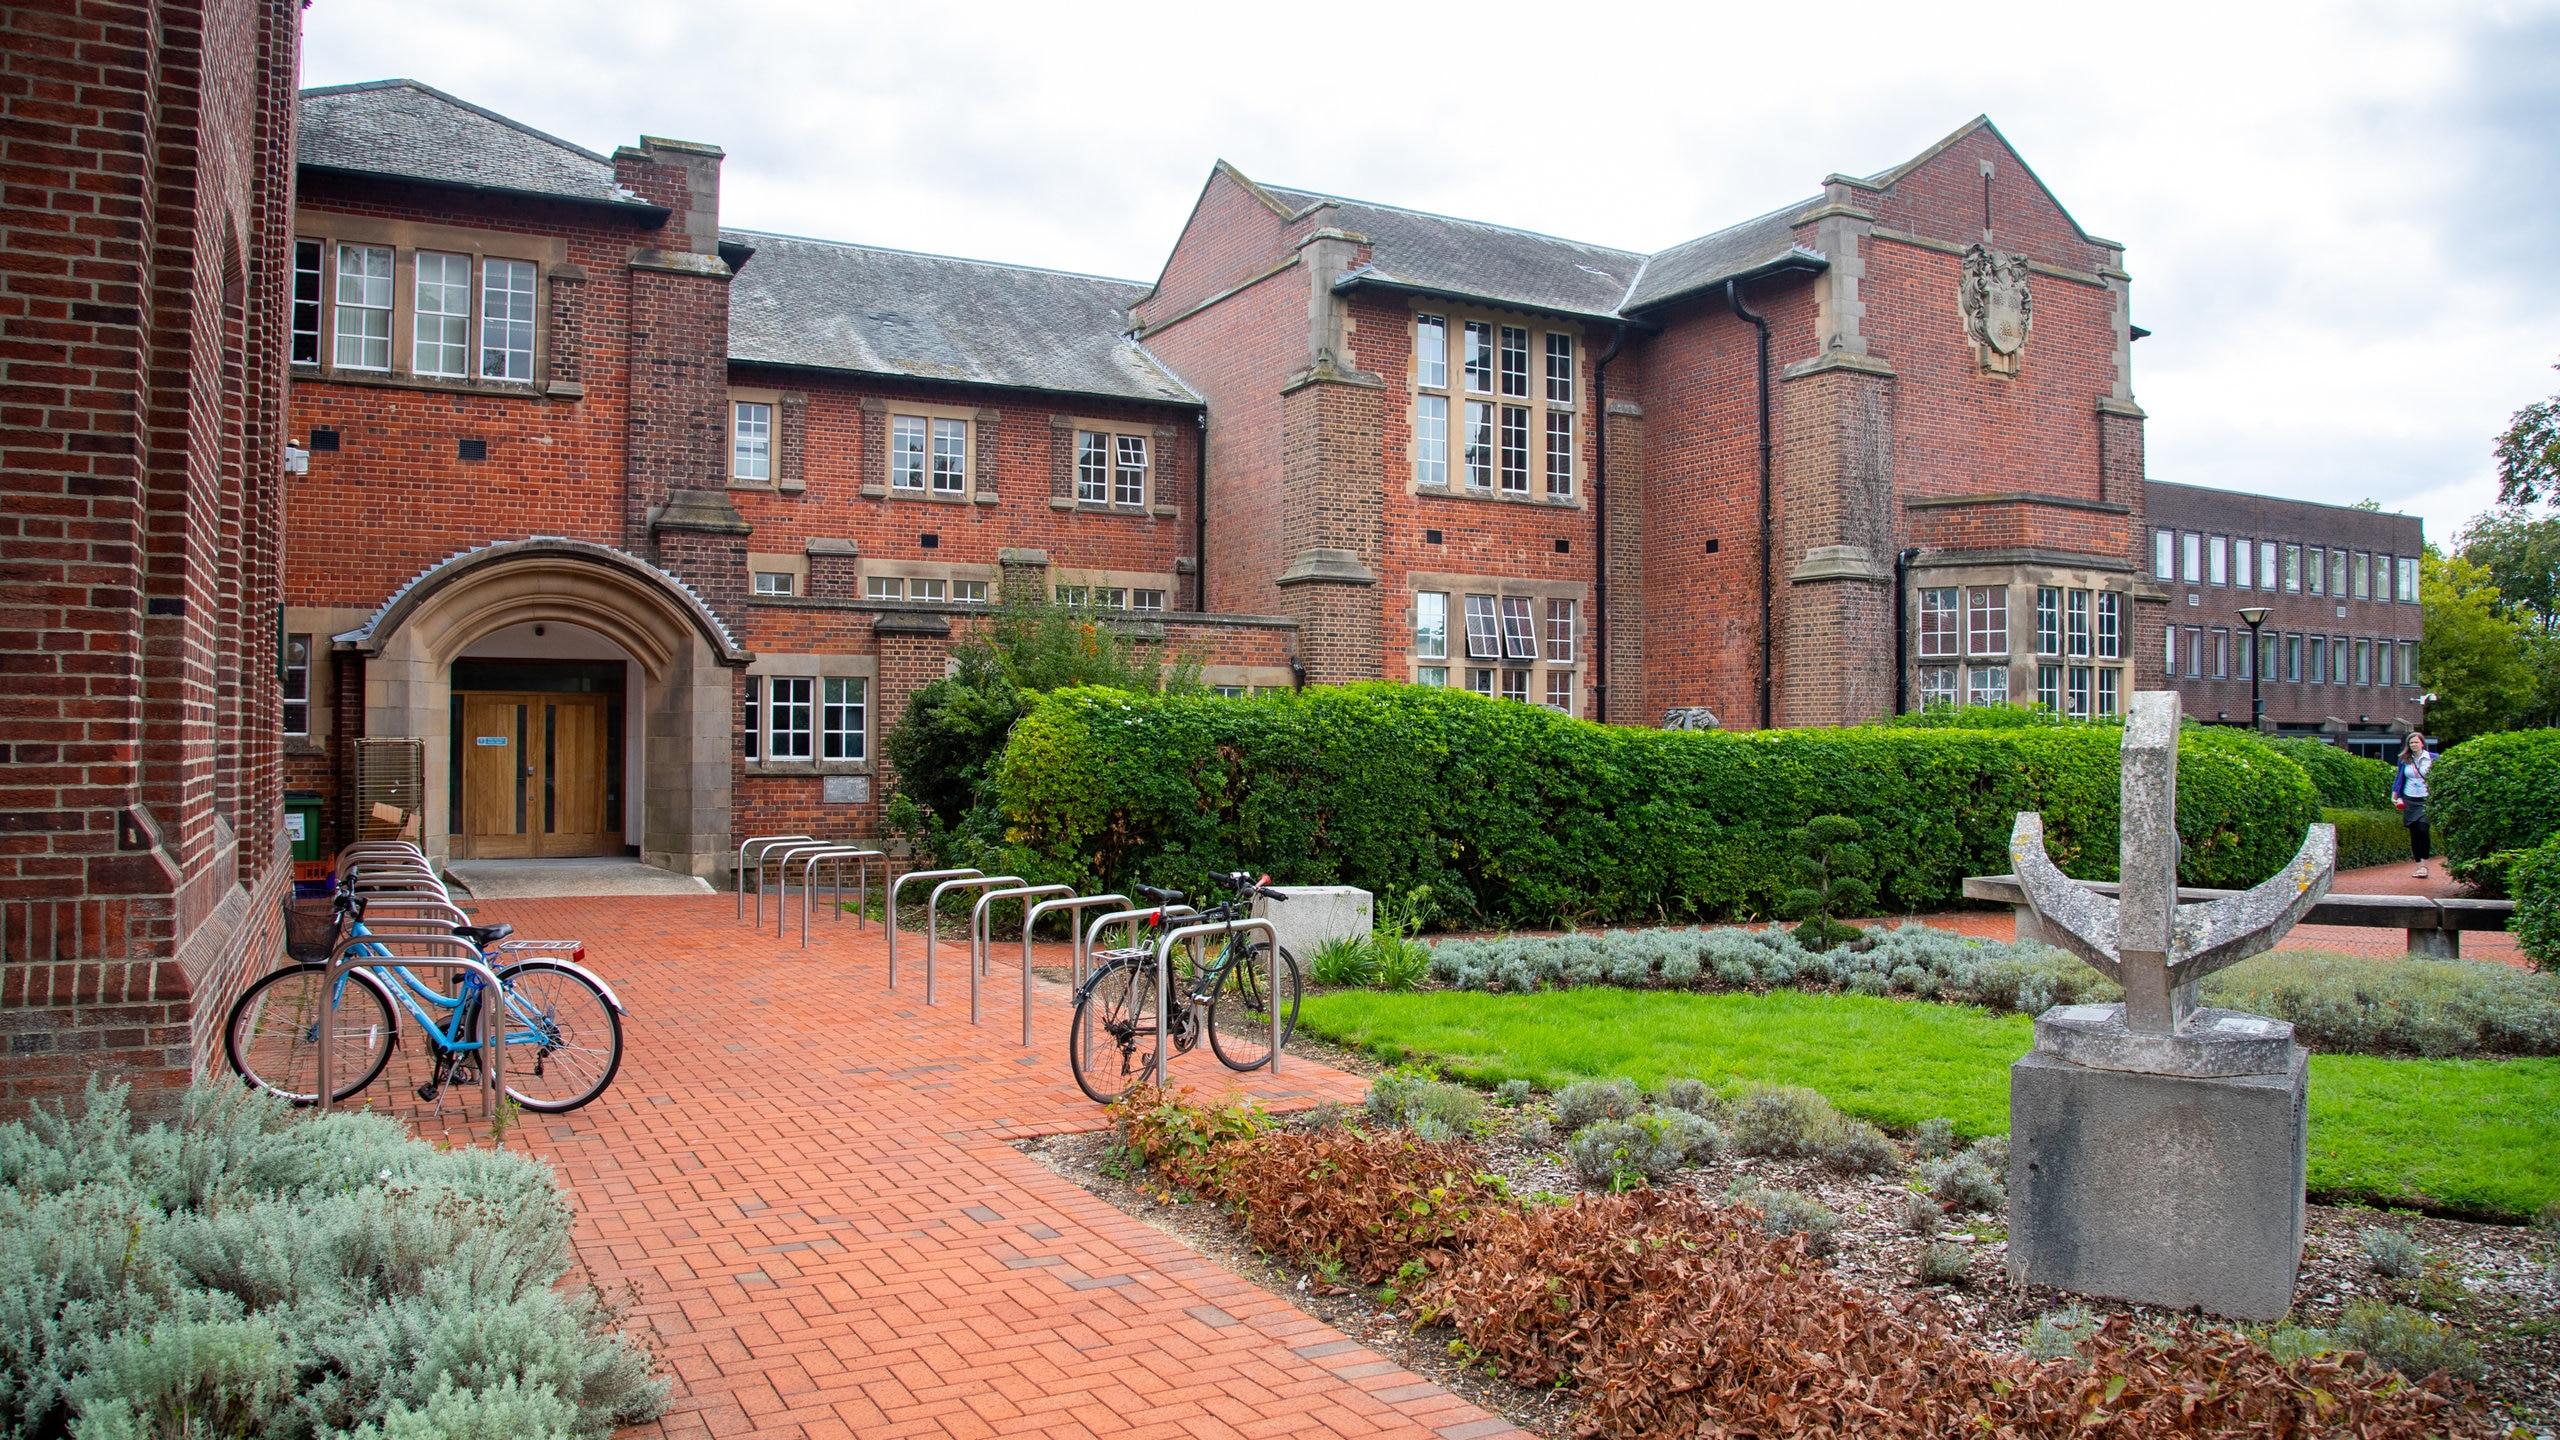 University of Southampton, Southampton, England, United Kingdom